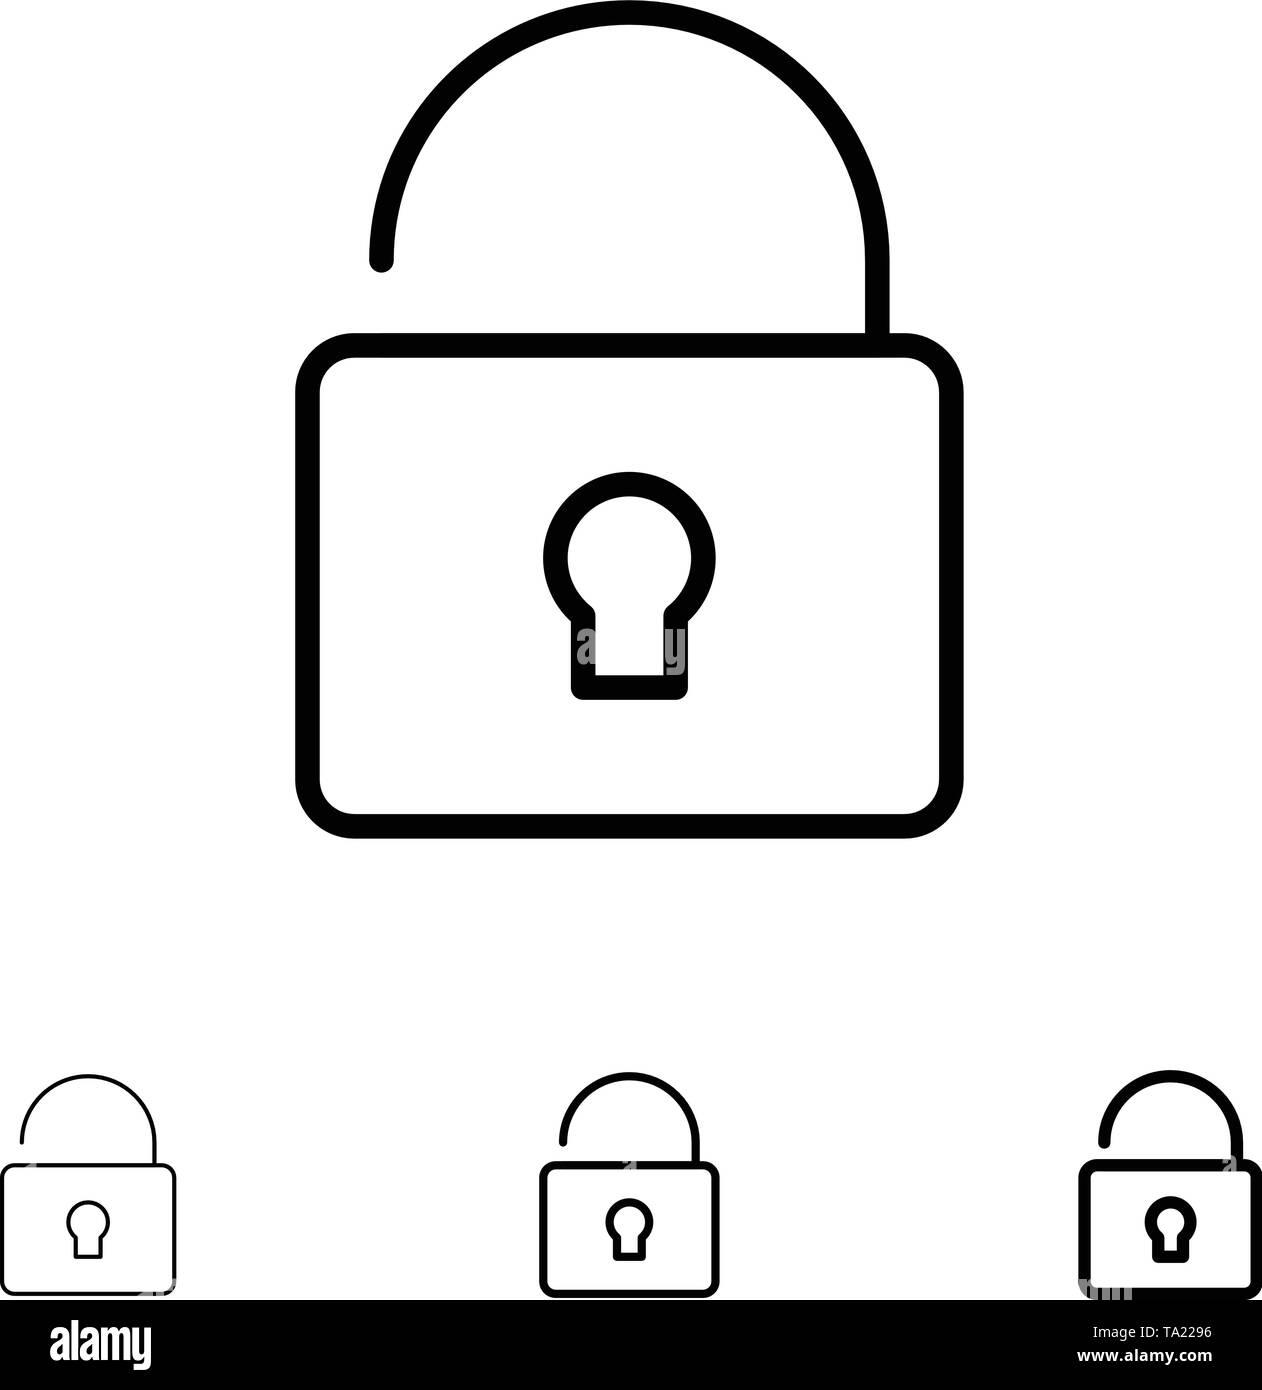 Unlock, Lock, Security Bold and thin black line icon set - Stock Image